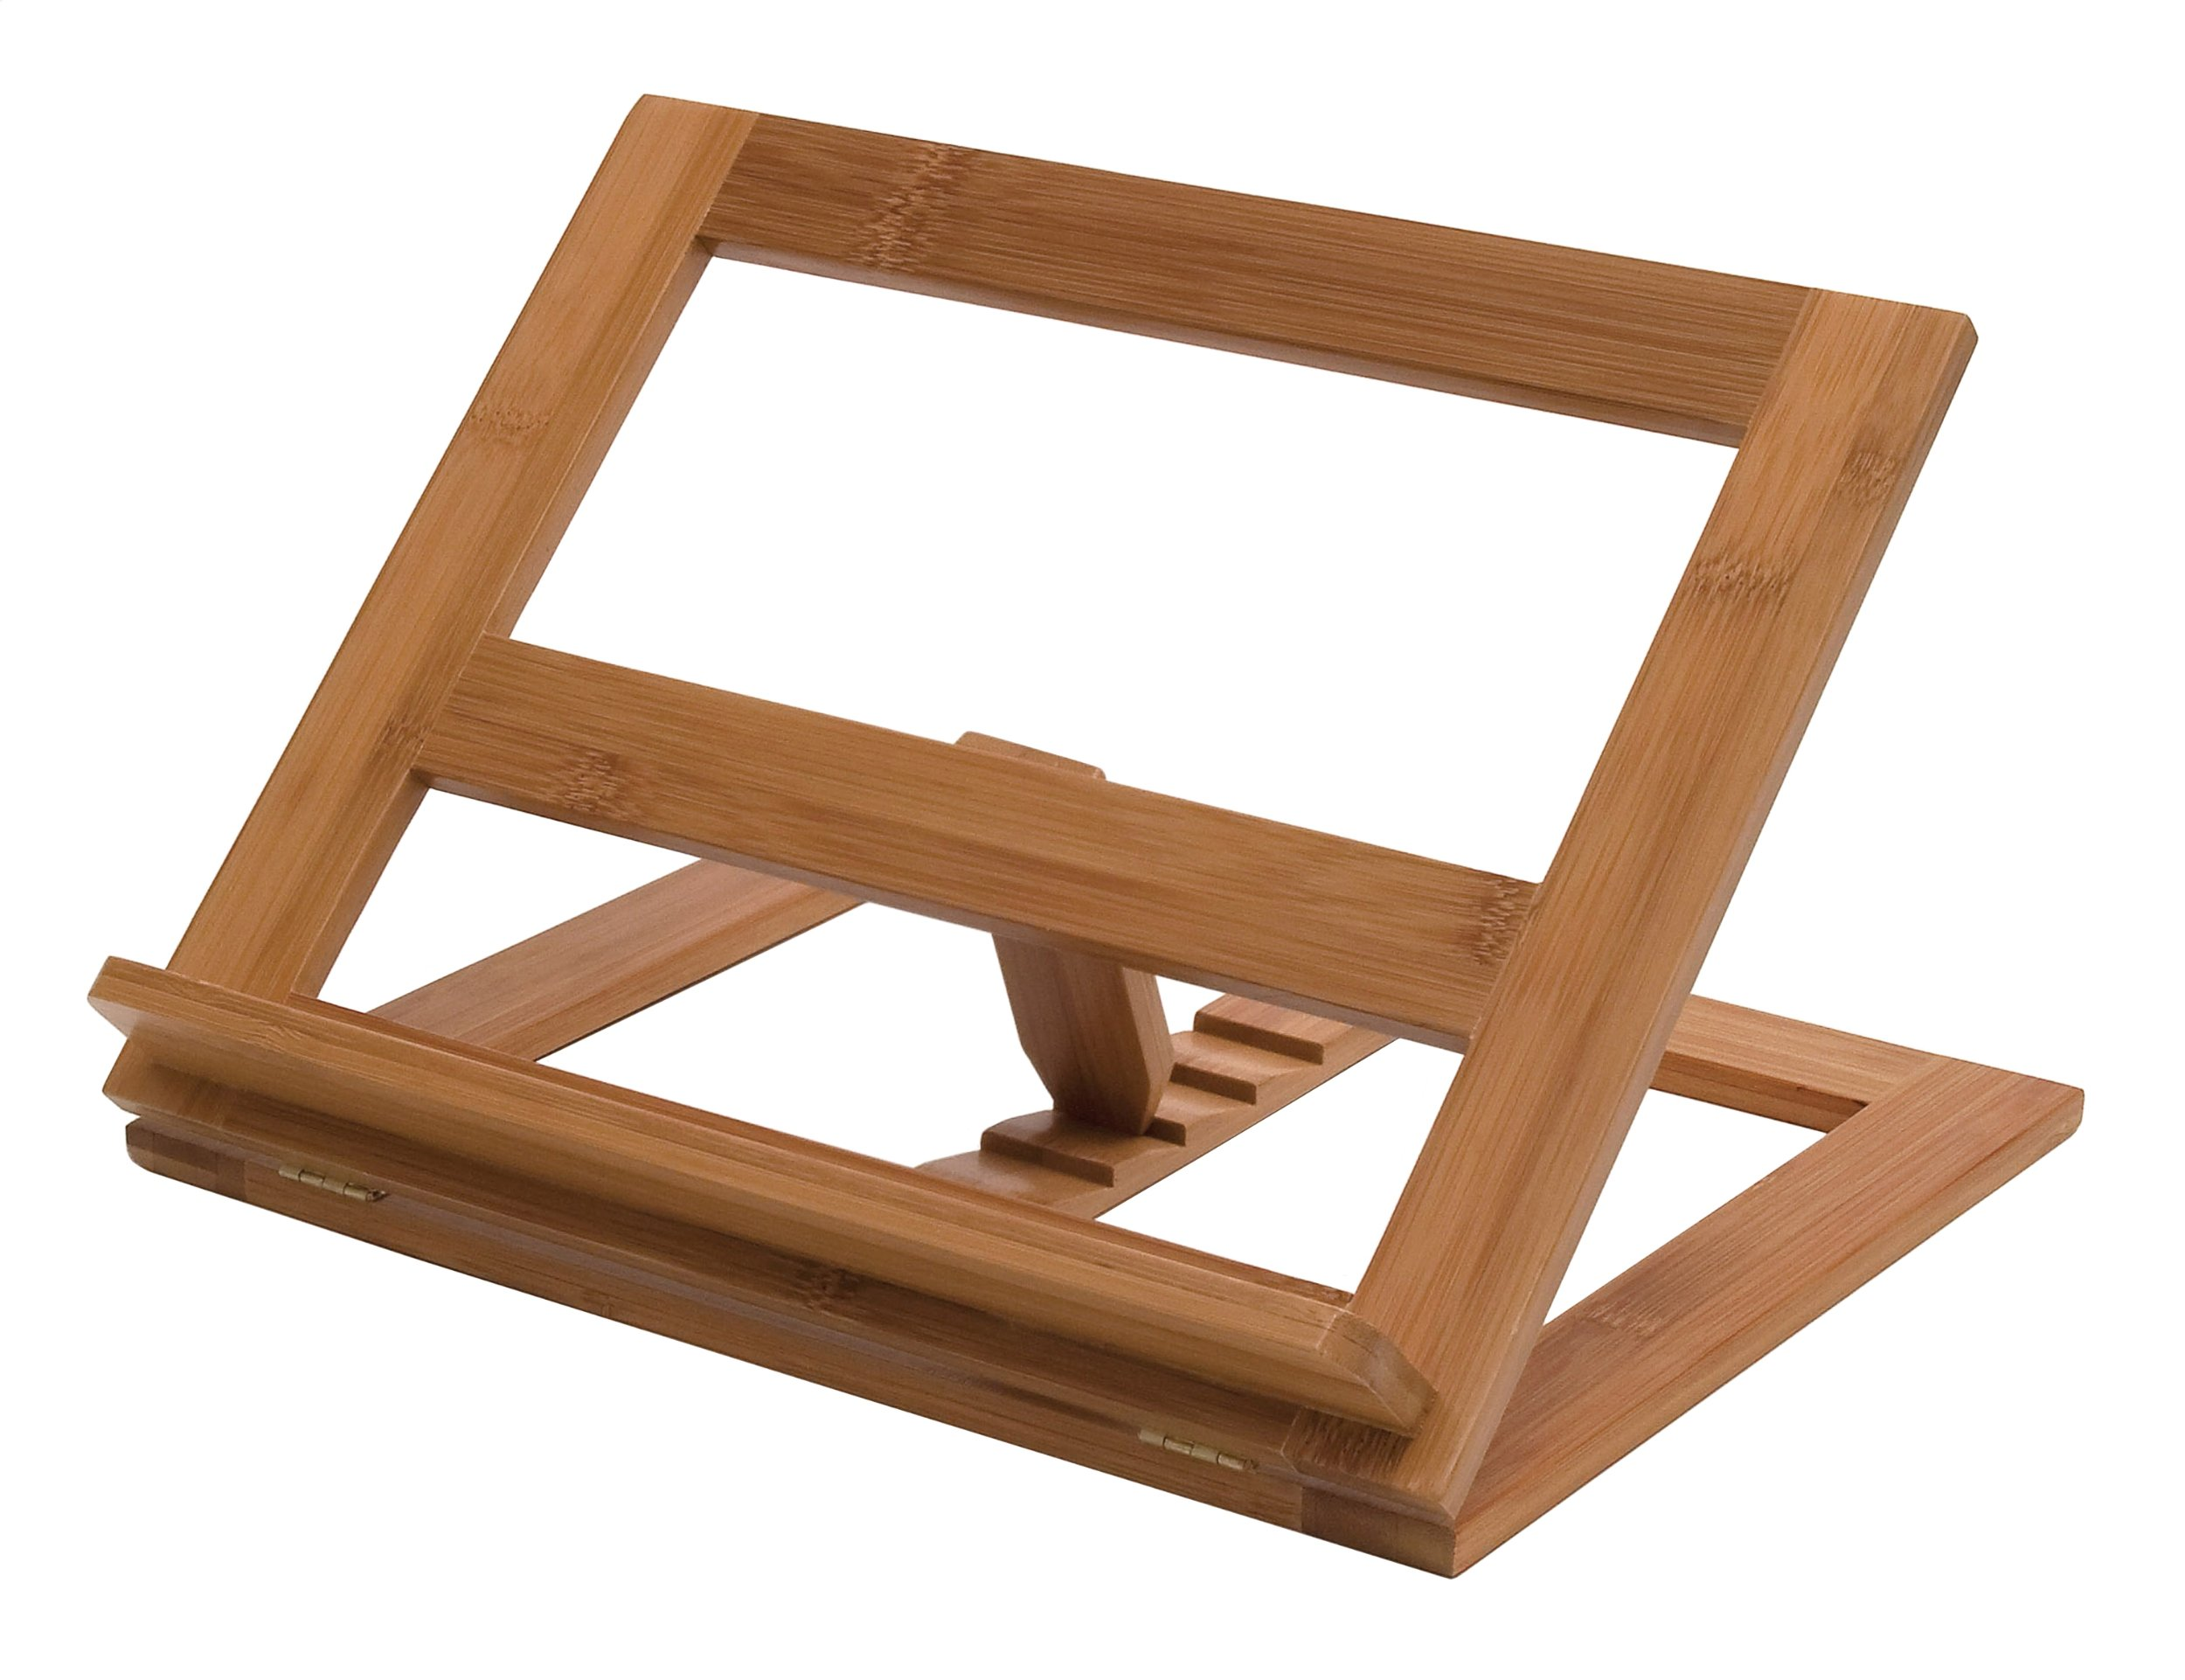 Lipper International 8825 Bamboo Wood Cookbook Holder, 13-1/4'' x 11-1/2'' x 8-1/2'' by Lipper International